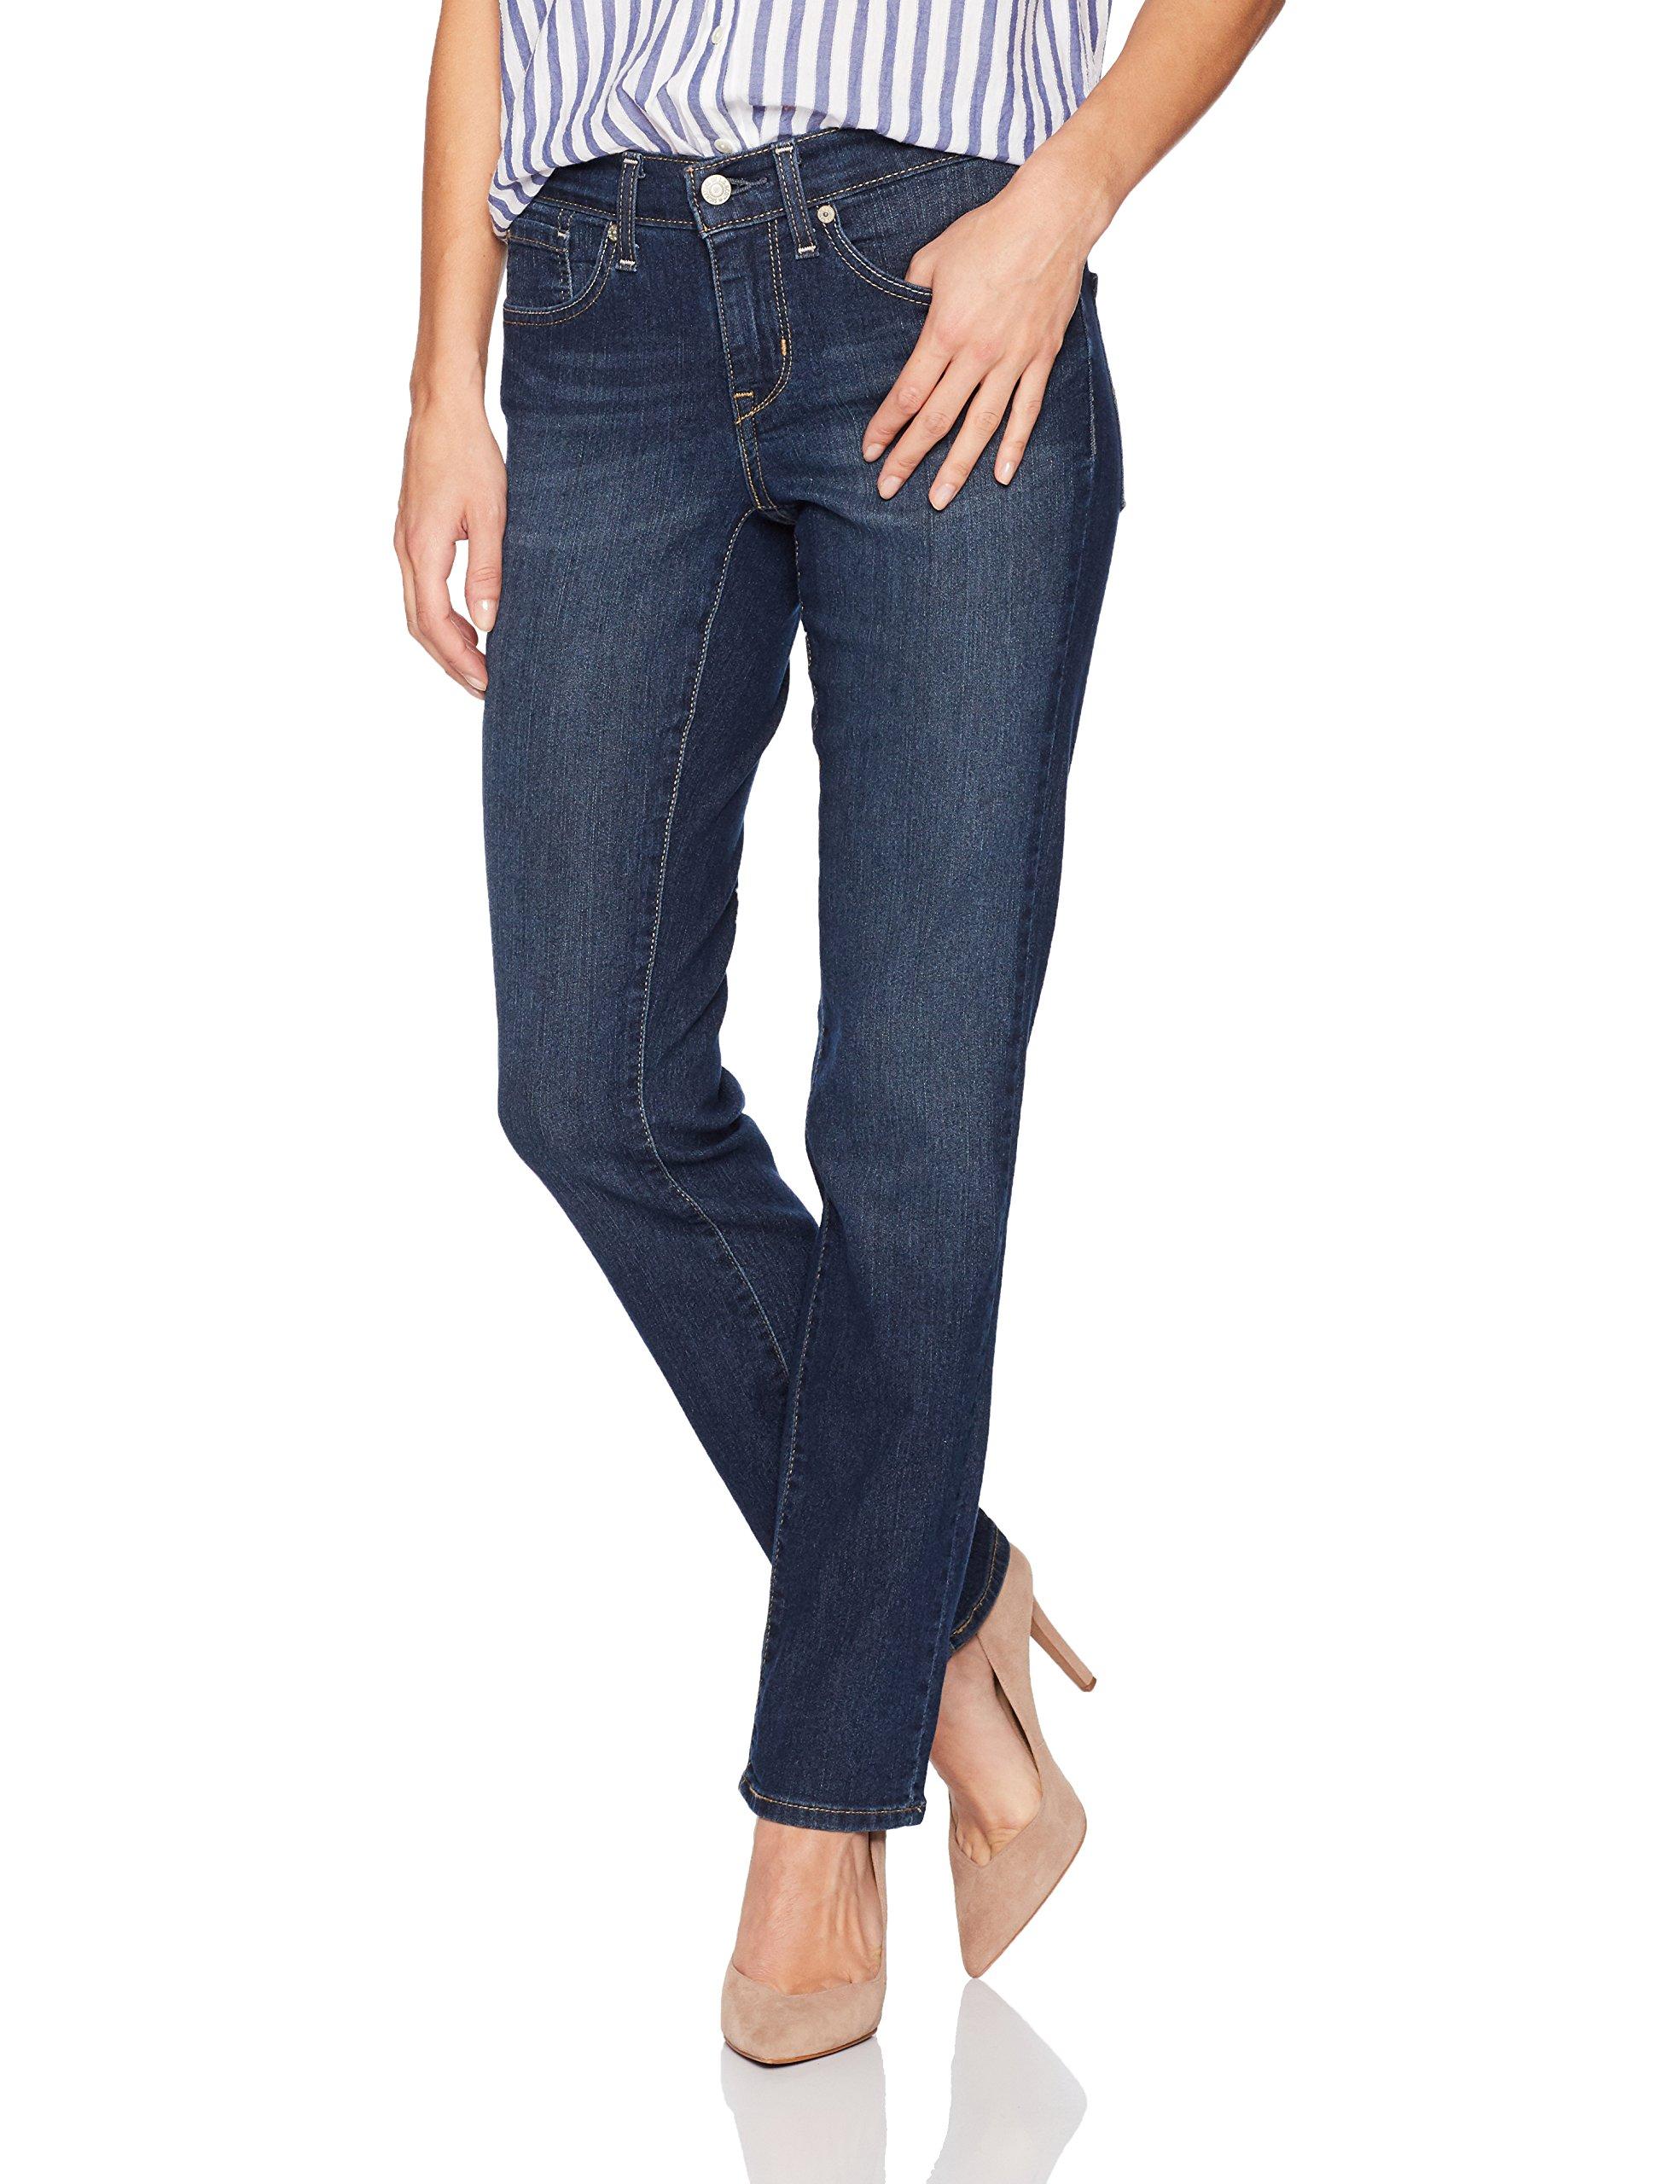 Signature by Levi Strauss & Co Women's Curvy Straight Jeans, Awaken, 12 Medium